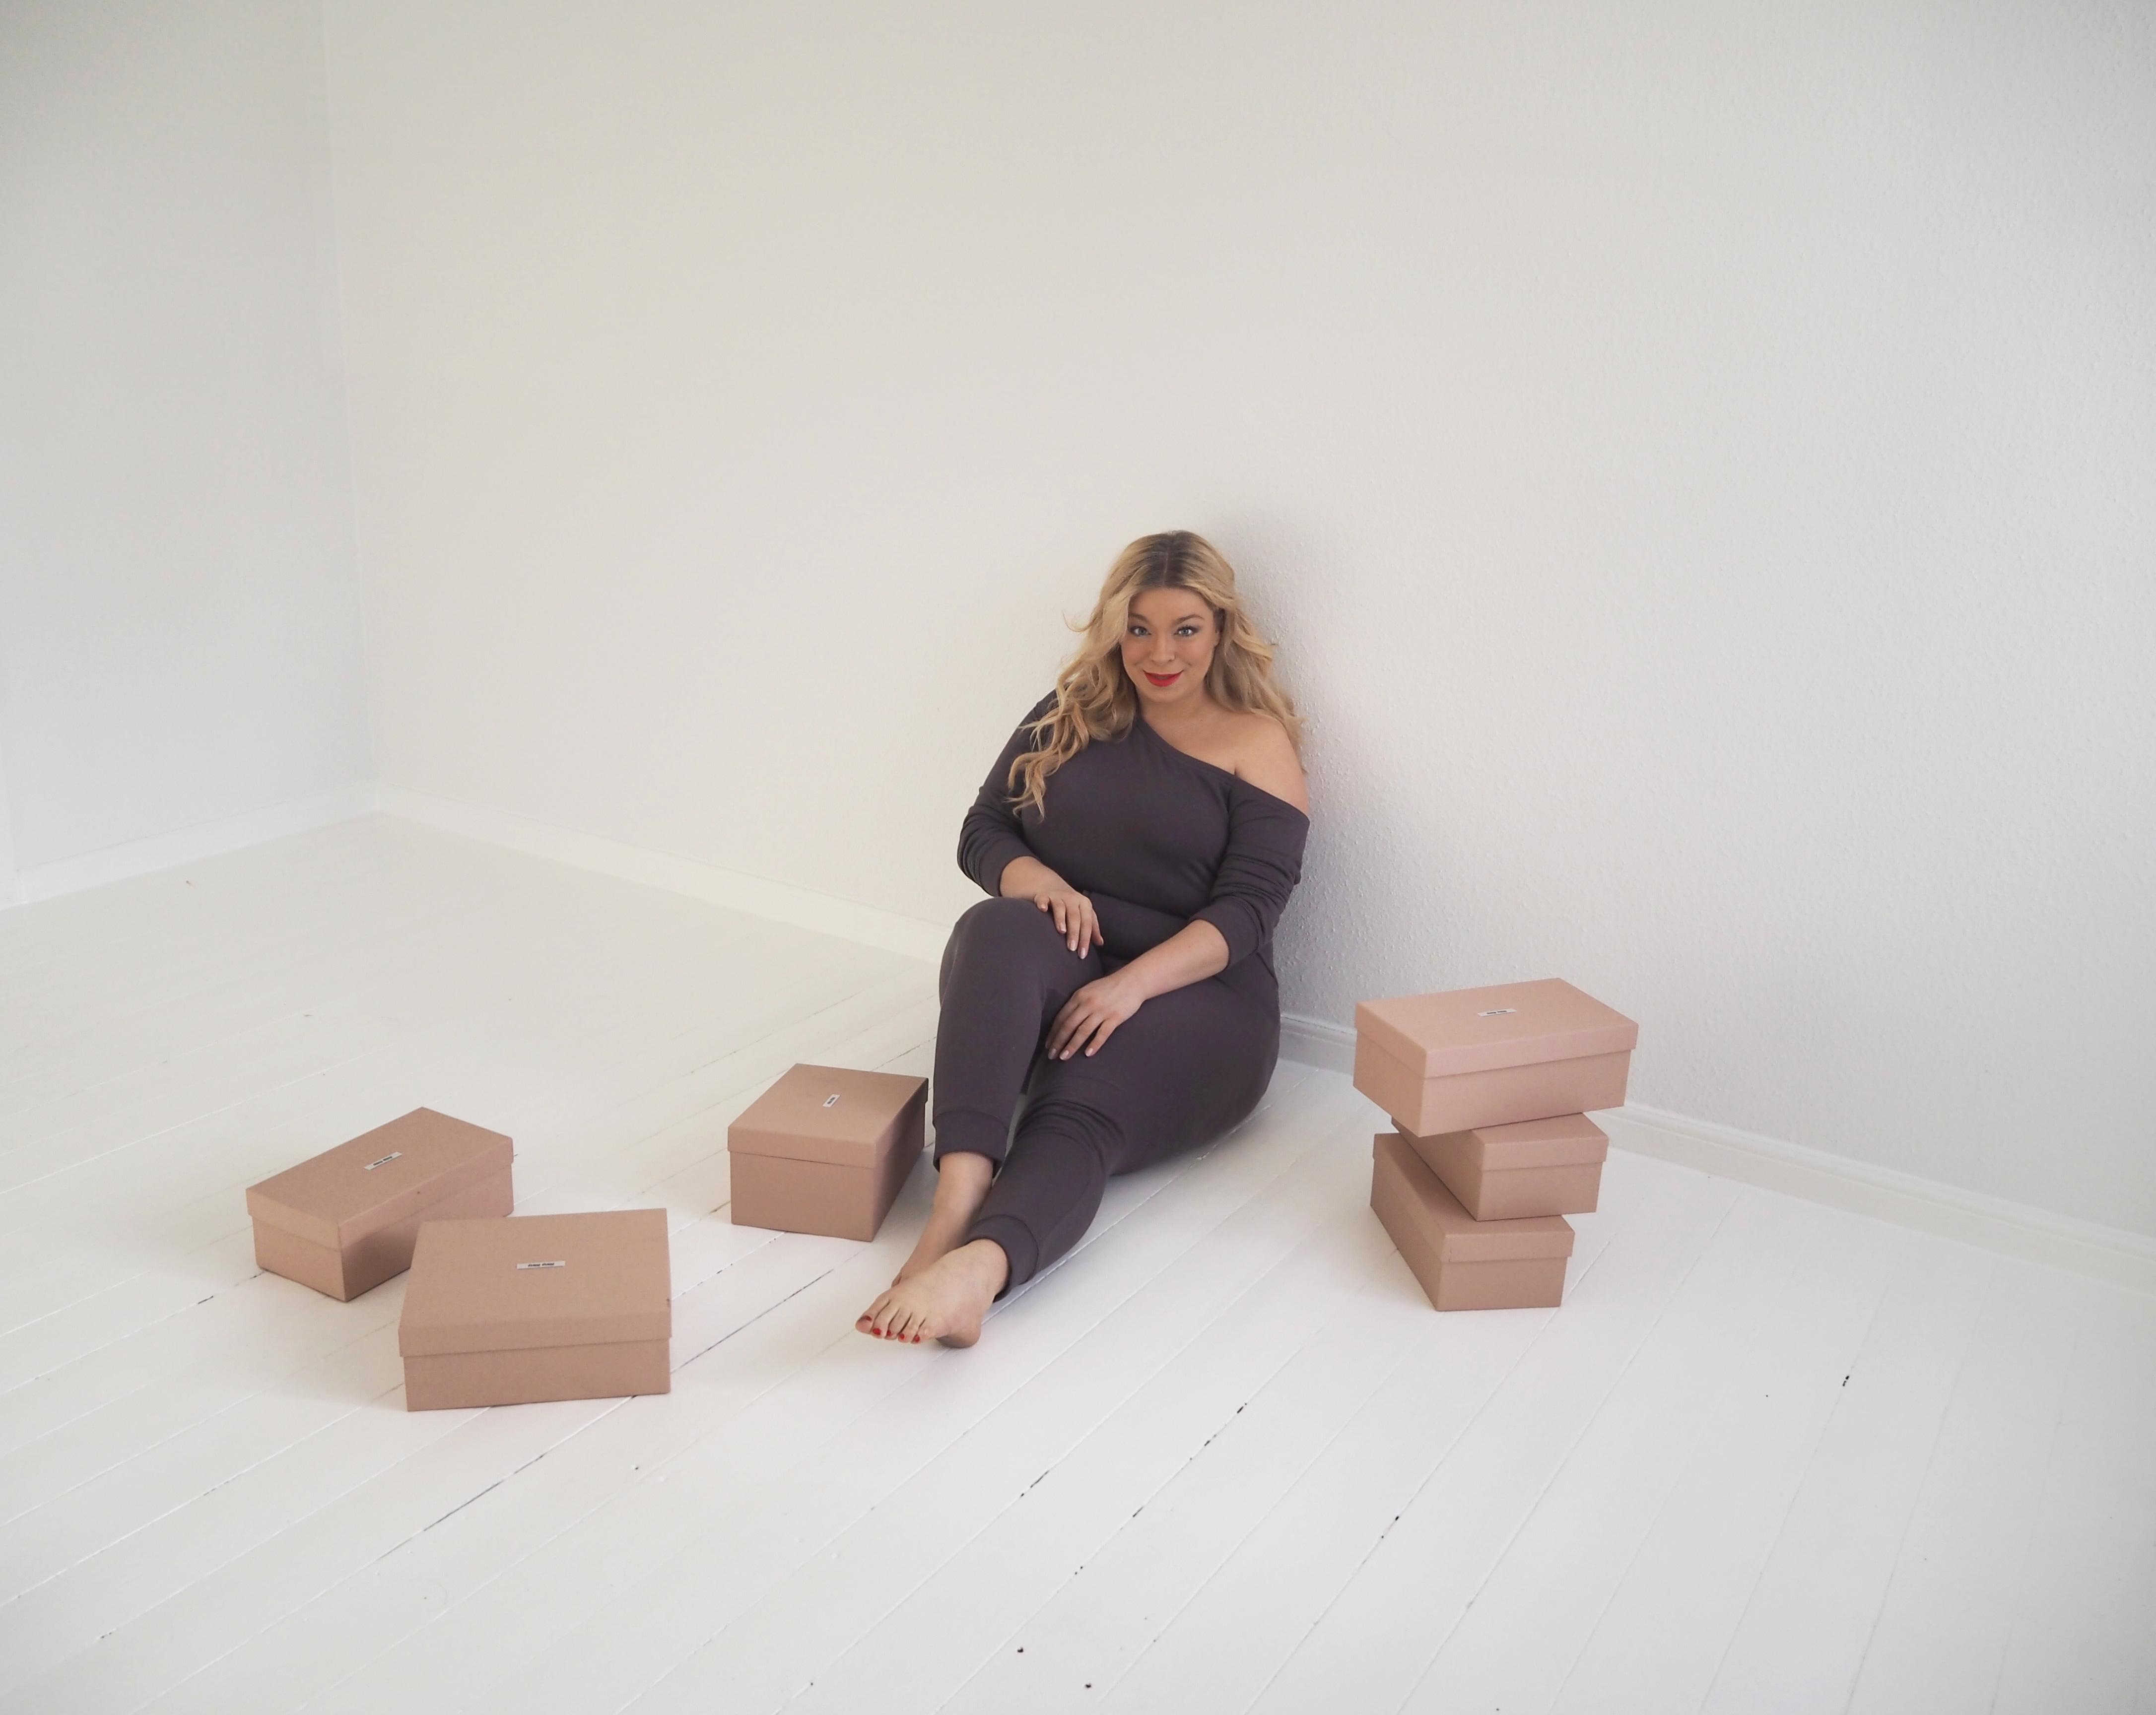 Caterina-megabambi-Homewear-plussize-curvy-Bloggerin